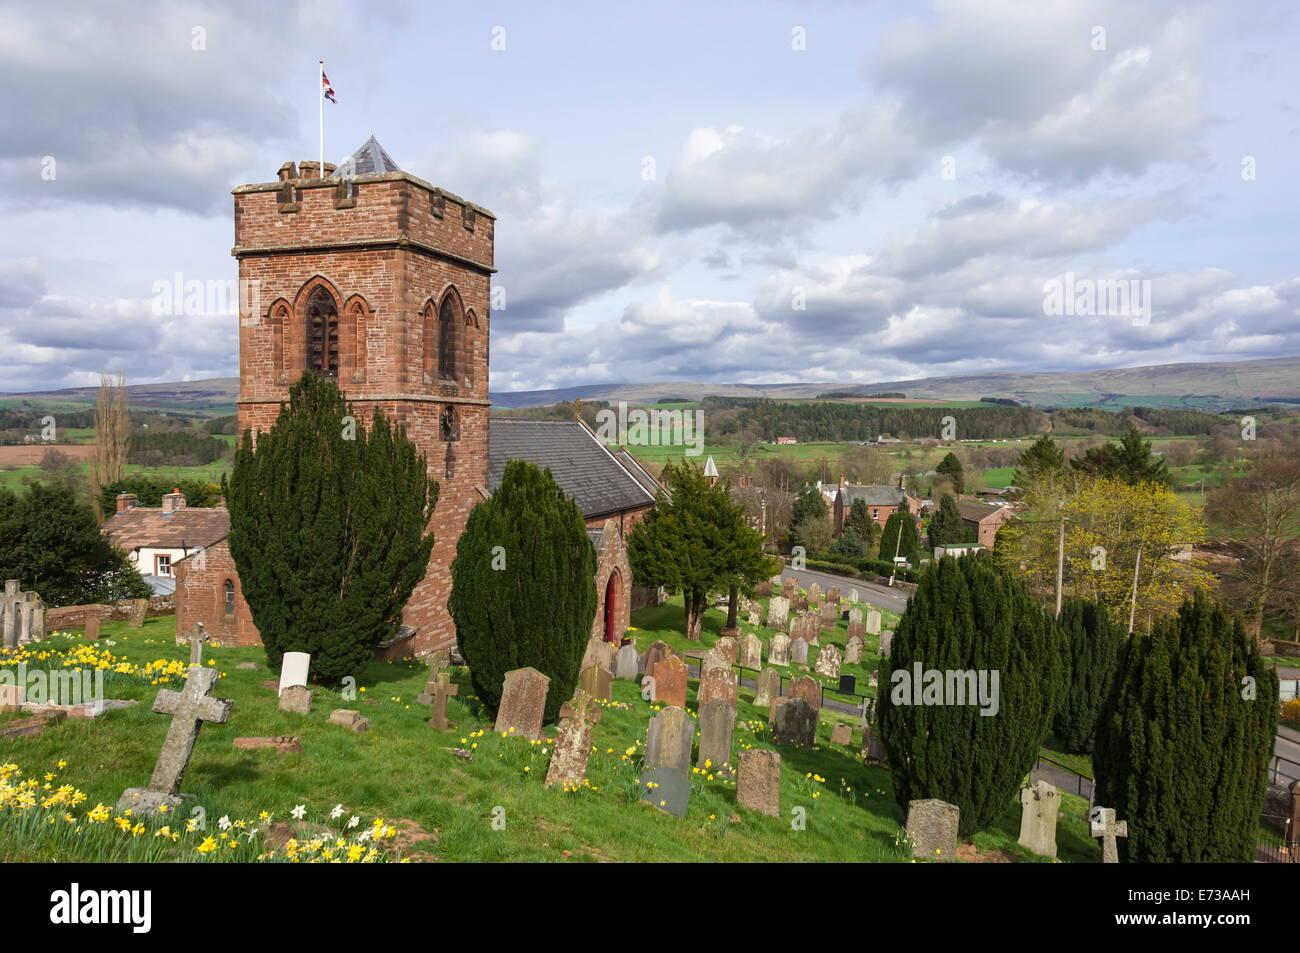 St. Nicholas Church, Crucifixion Window by Mayer of Munich, Lazonby Village, Pennine Ridge beyond, Eden Valley, - Stock Image